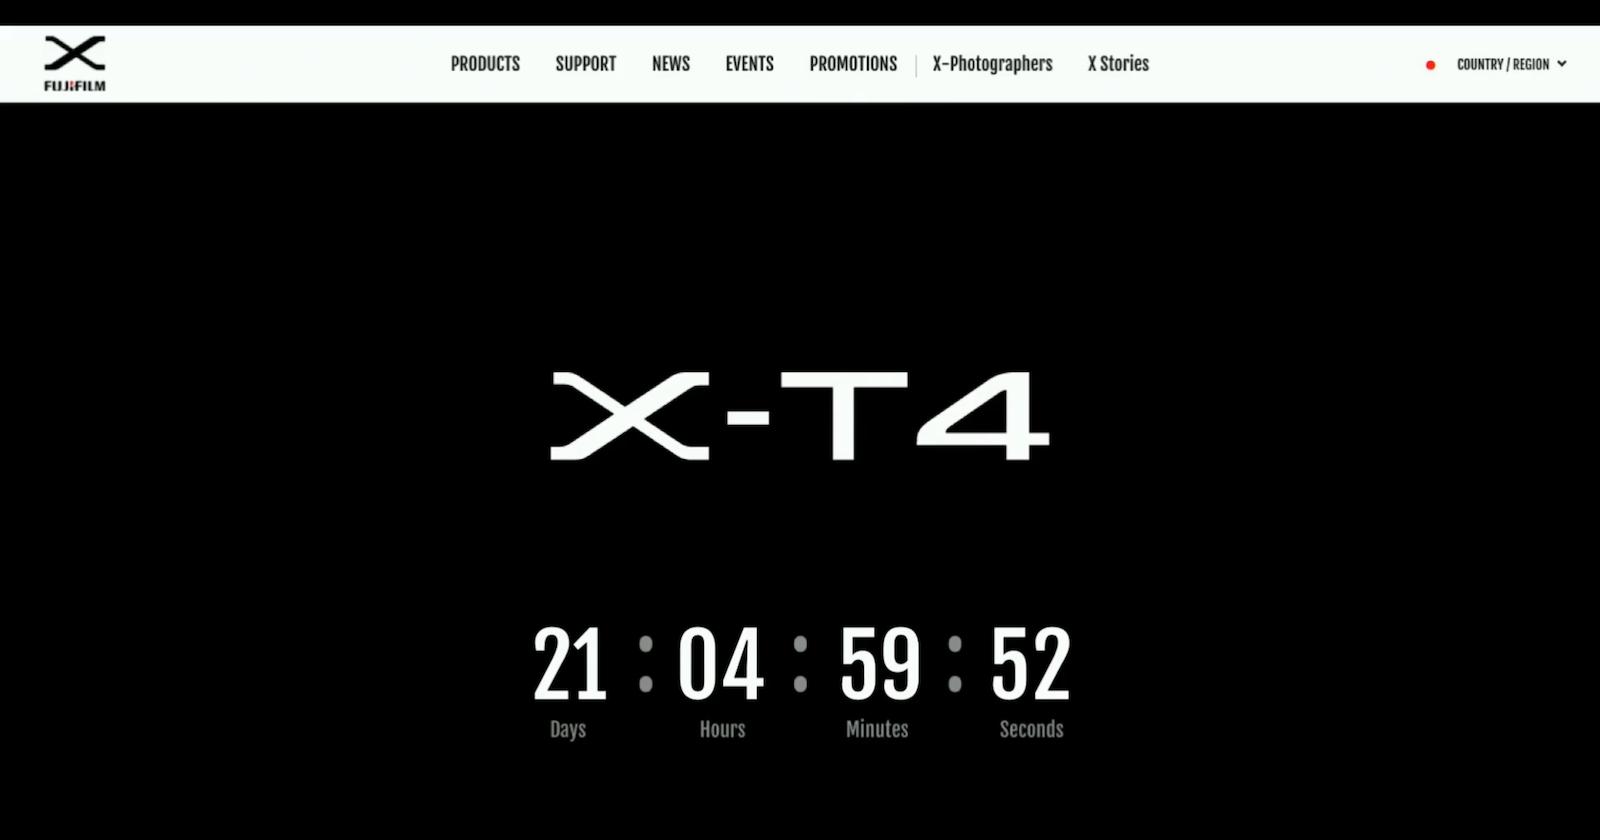 Fujifilm revelará la X-T4 el 26 de febrero